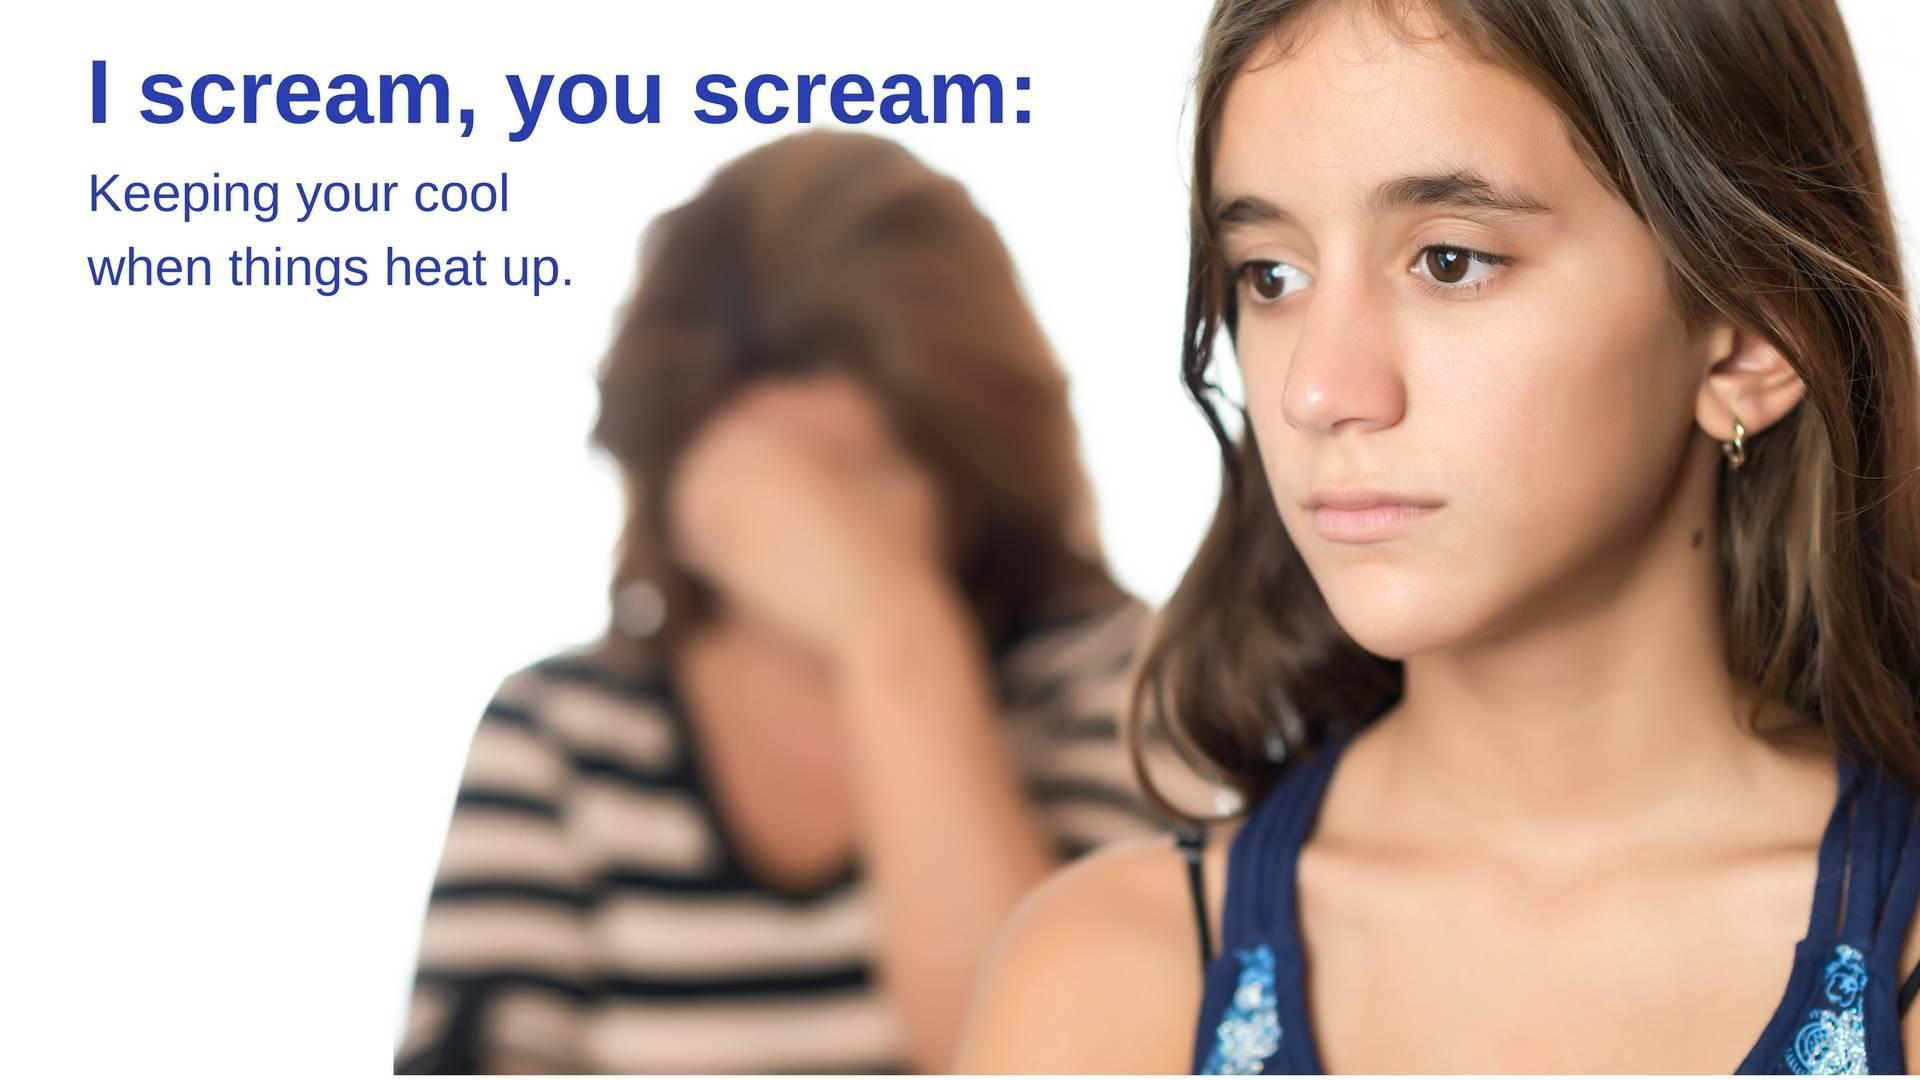 4cd2c6aa49a7ca5d80e5_I_Scream__You_Scream__Peace_Within__9_15_16.jpg